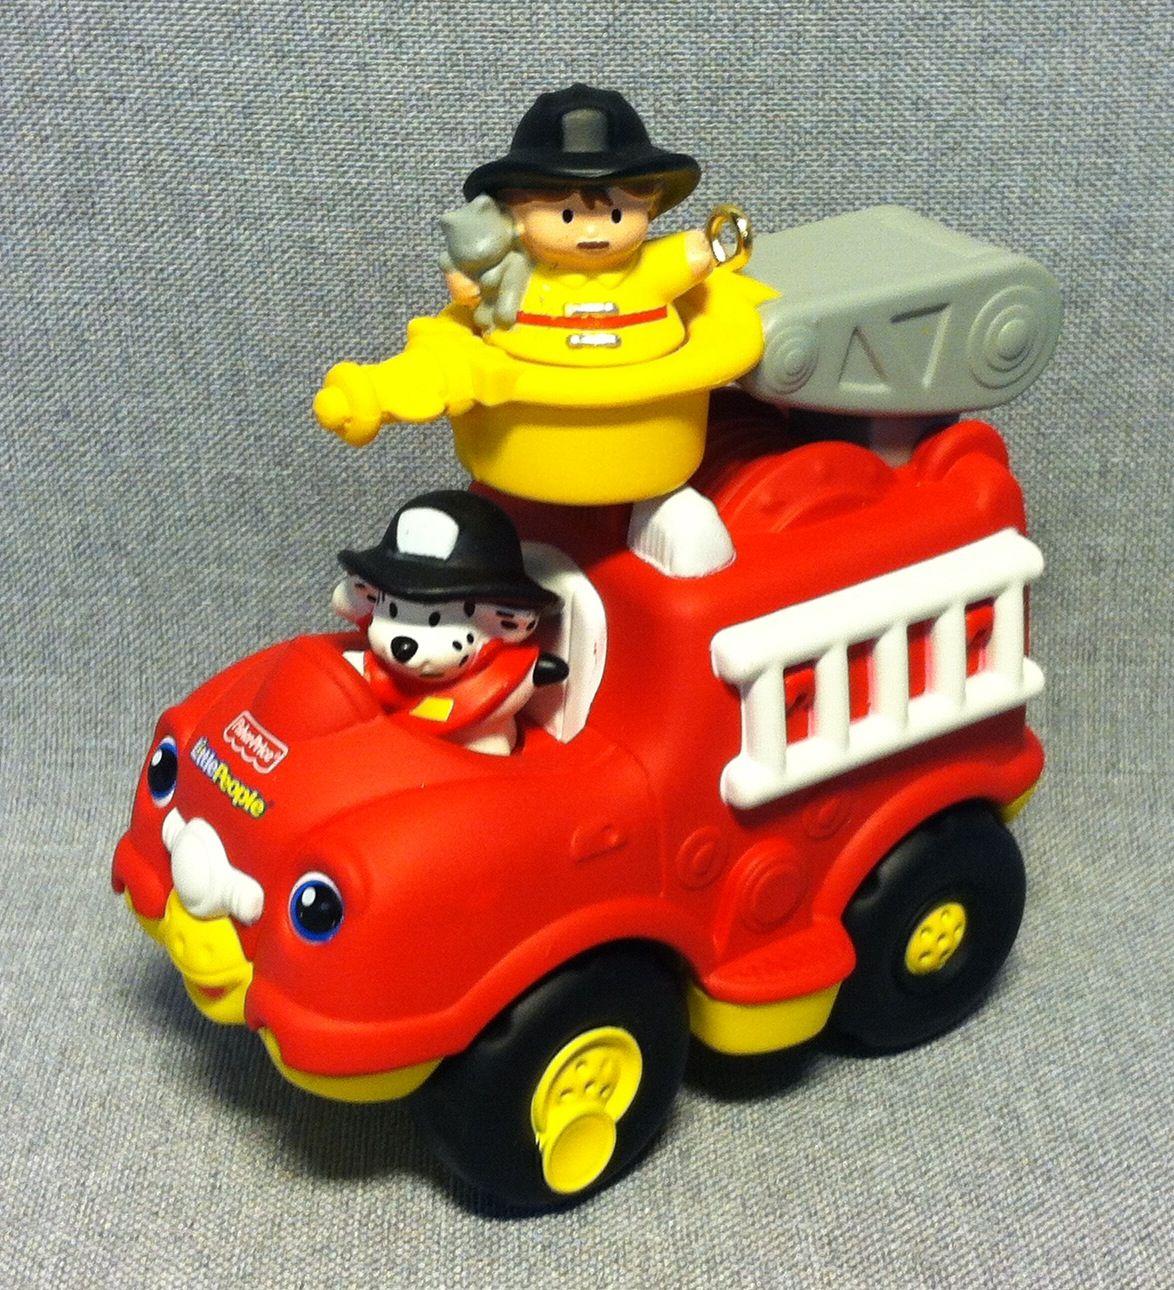 Little People - Lil' Movers Fire Truck - Hallmark - 2011